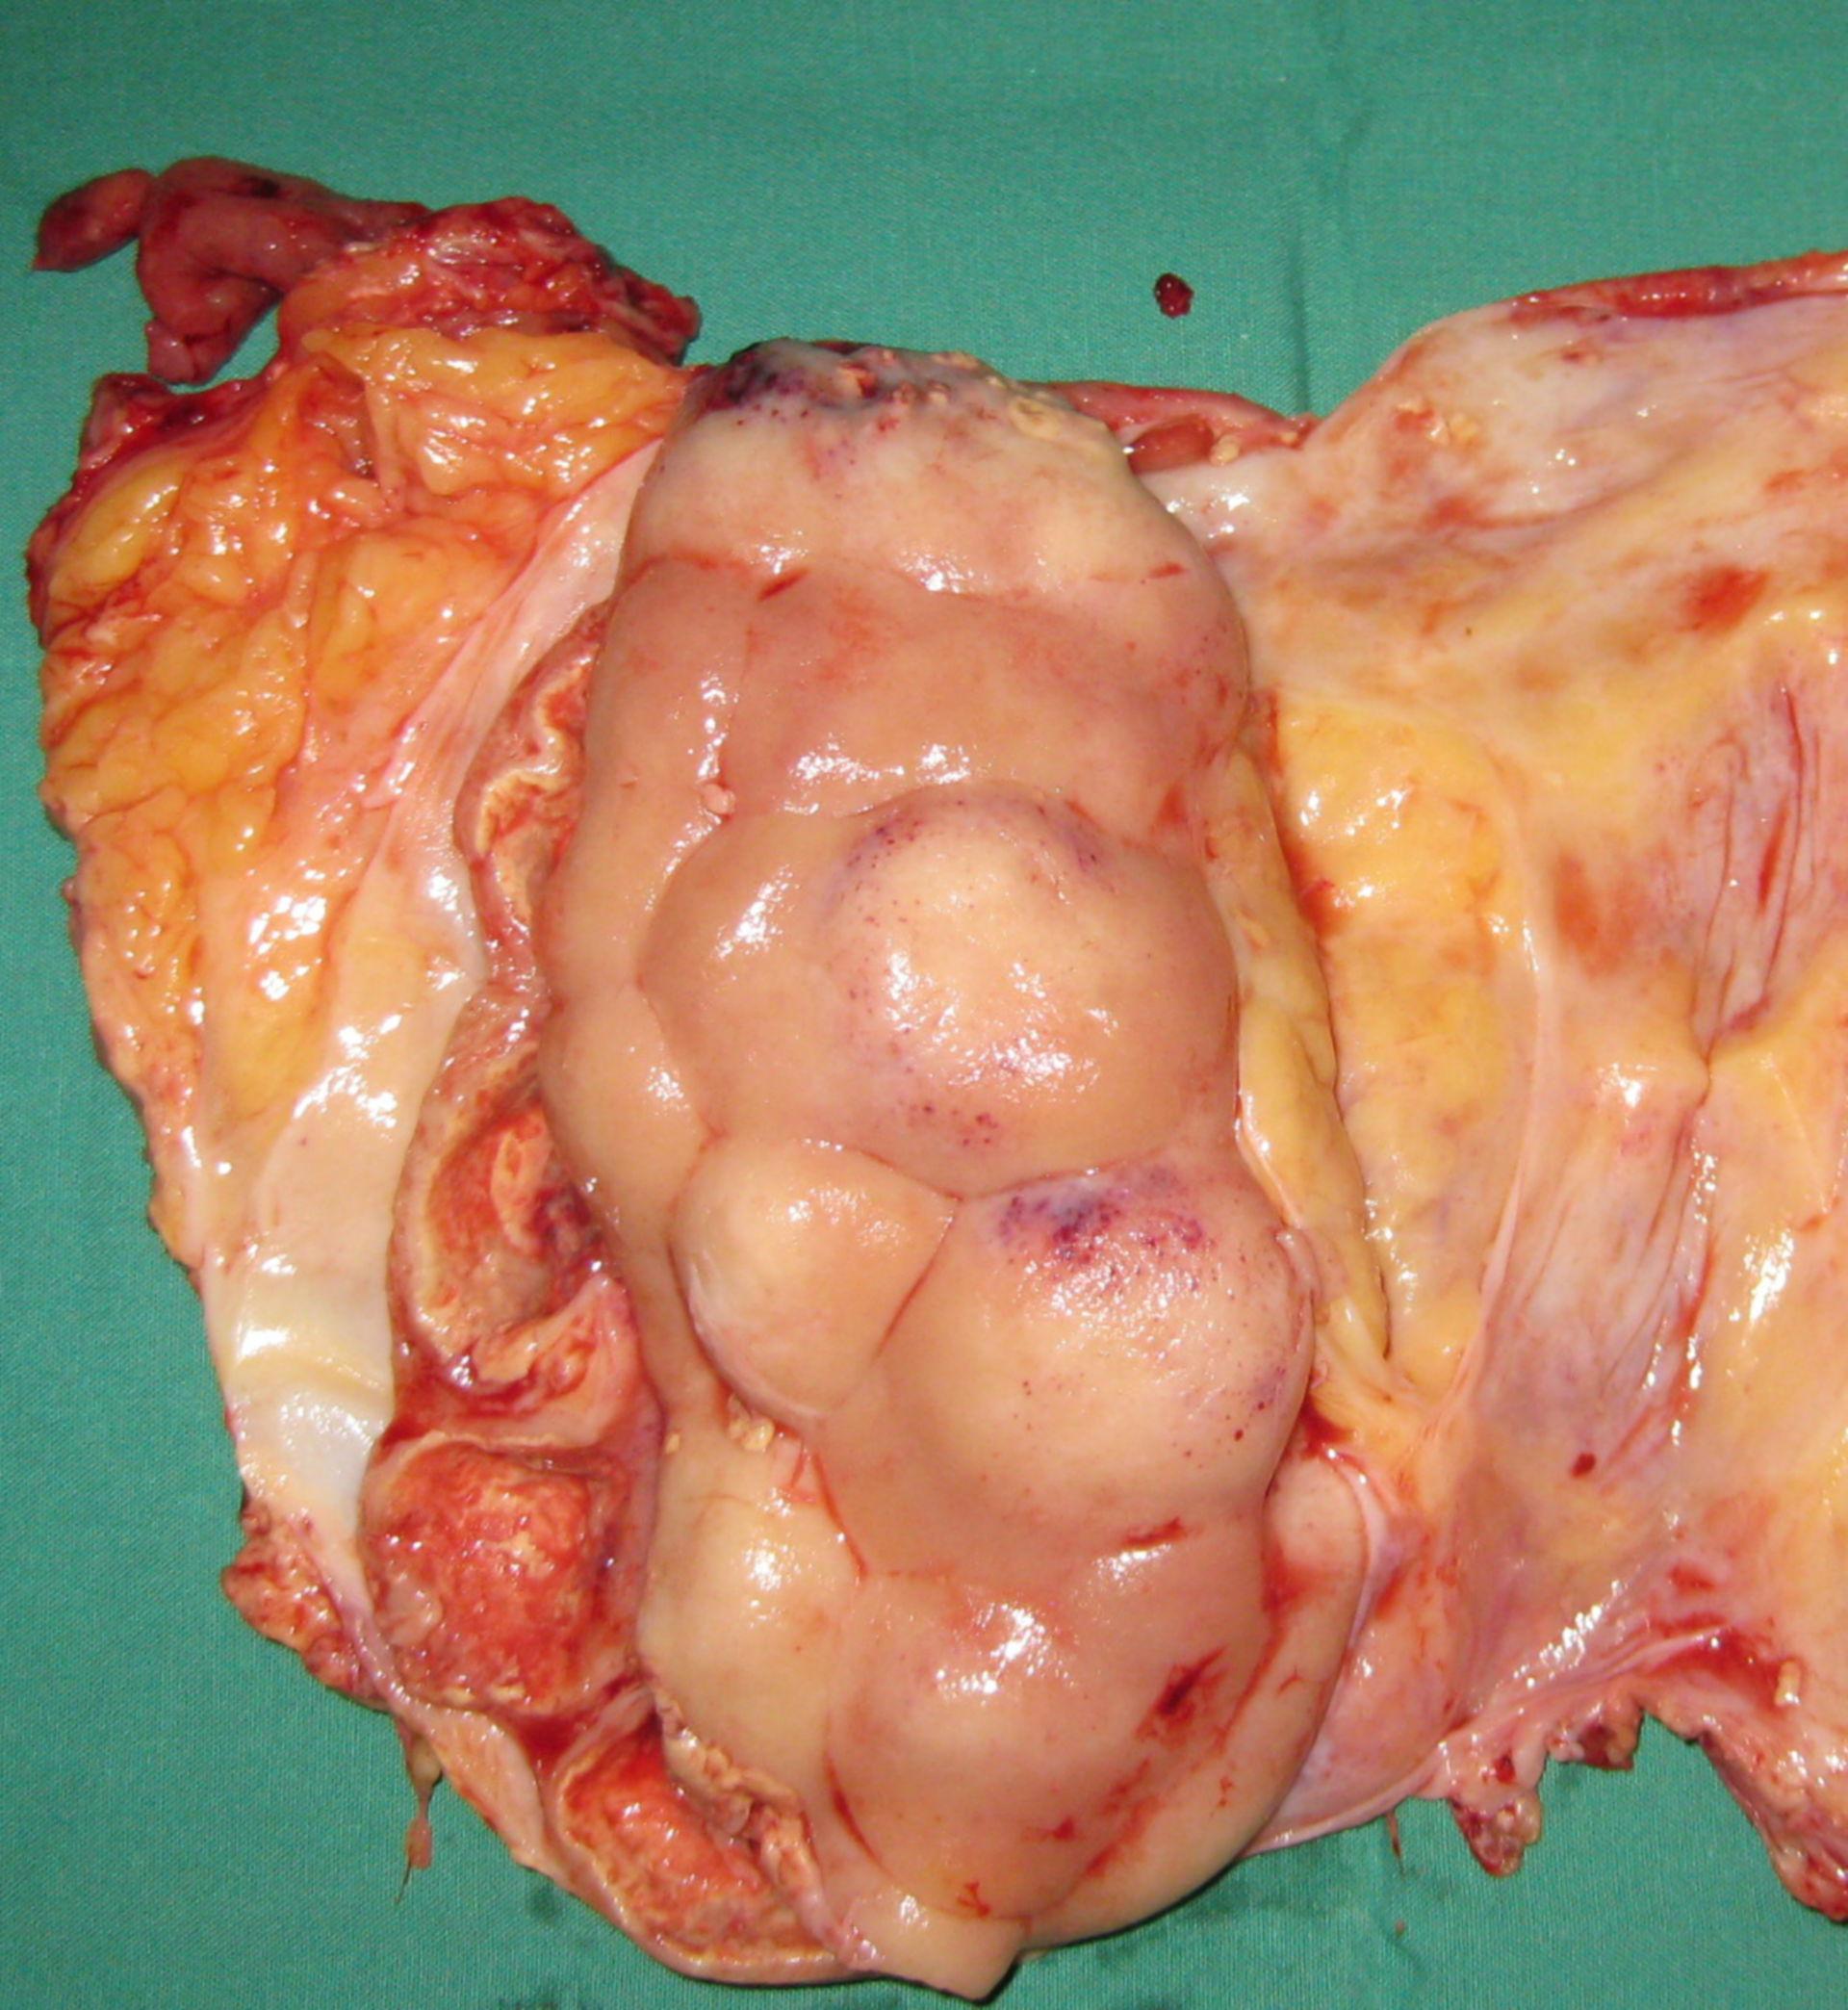 Pyonephrosis, renal capsula opened.